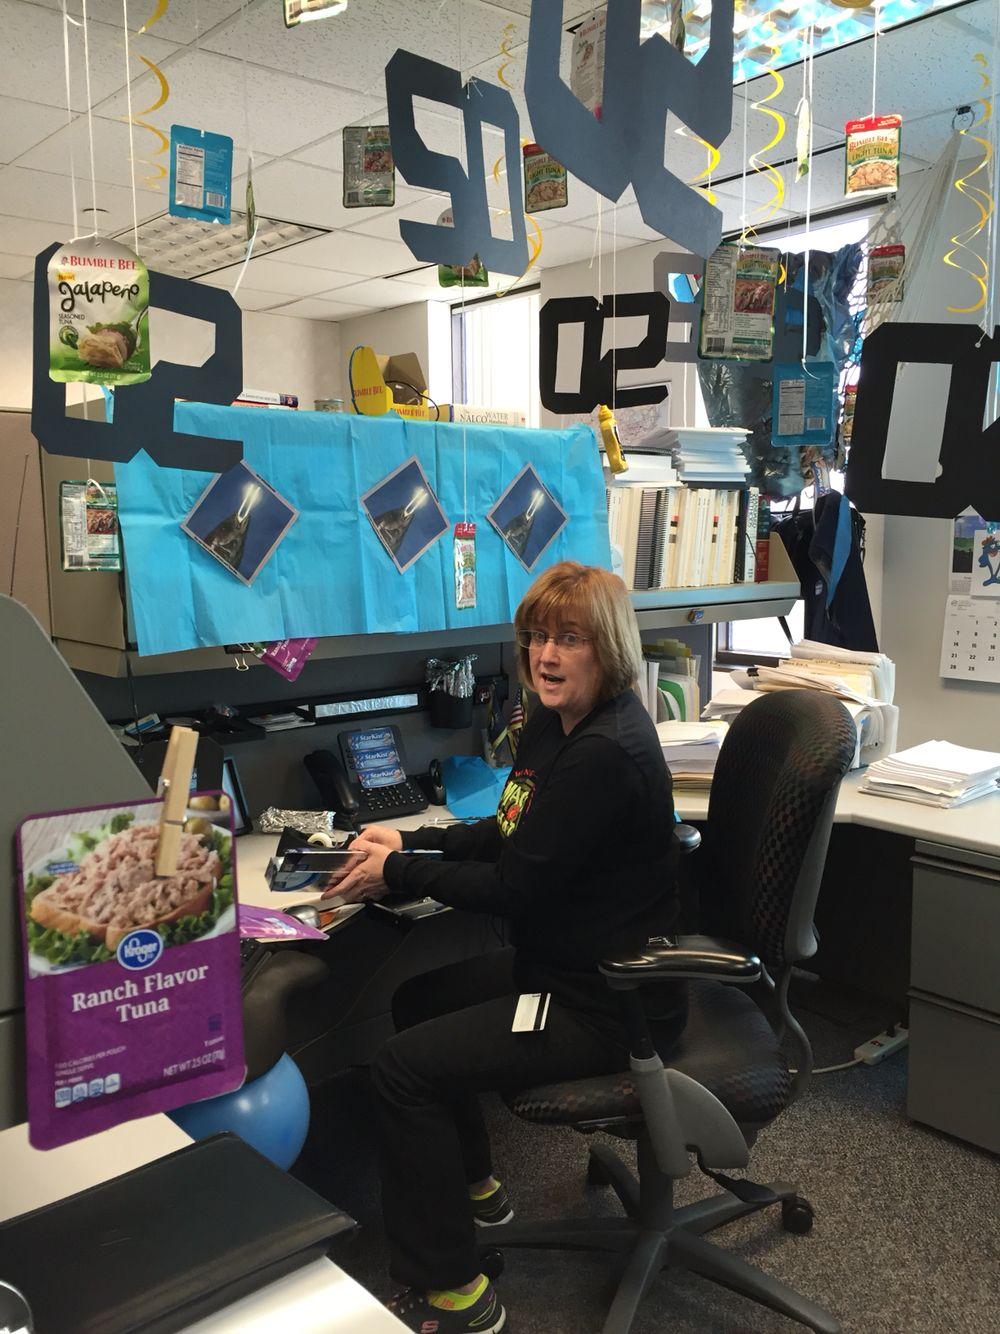 Workers Birthday Tuna Fun Cubicle Decor Office Cube